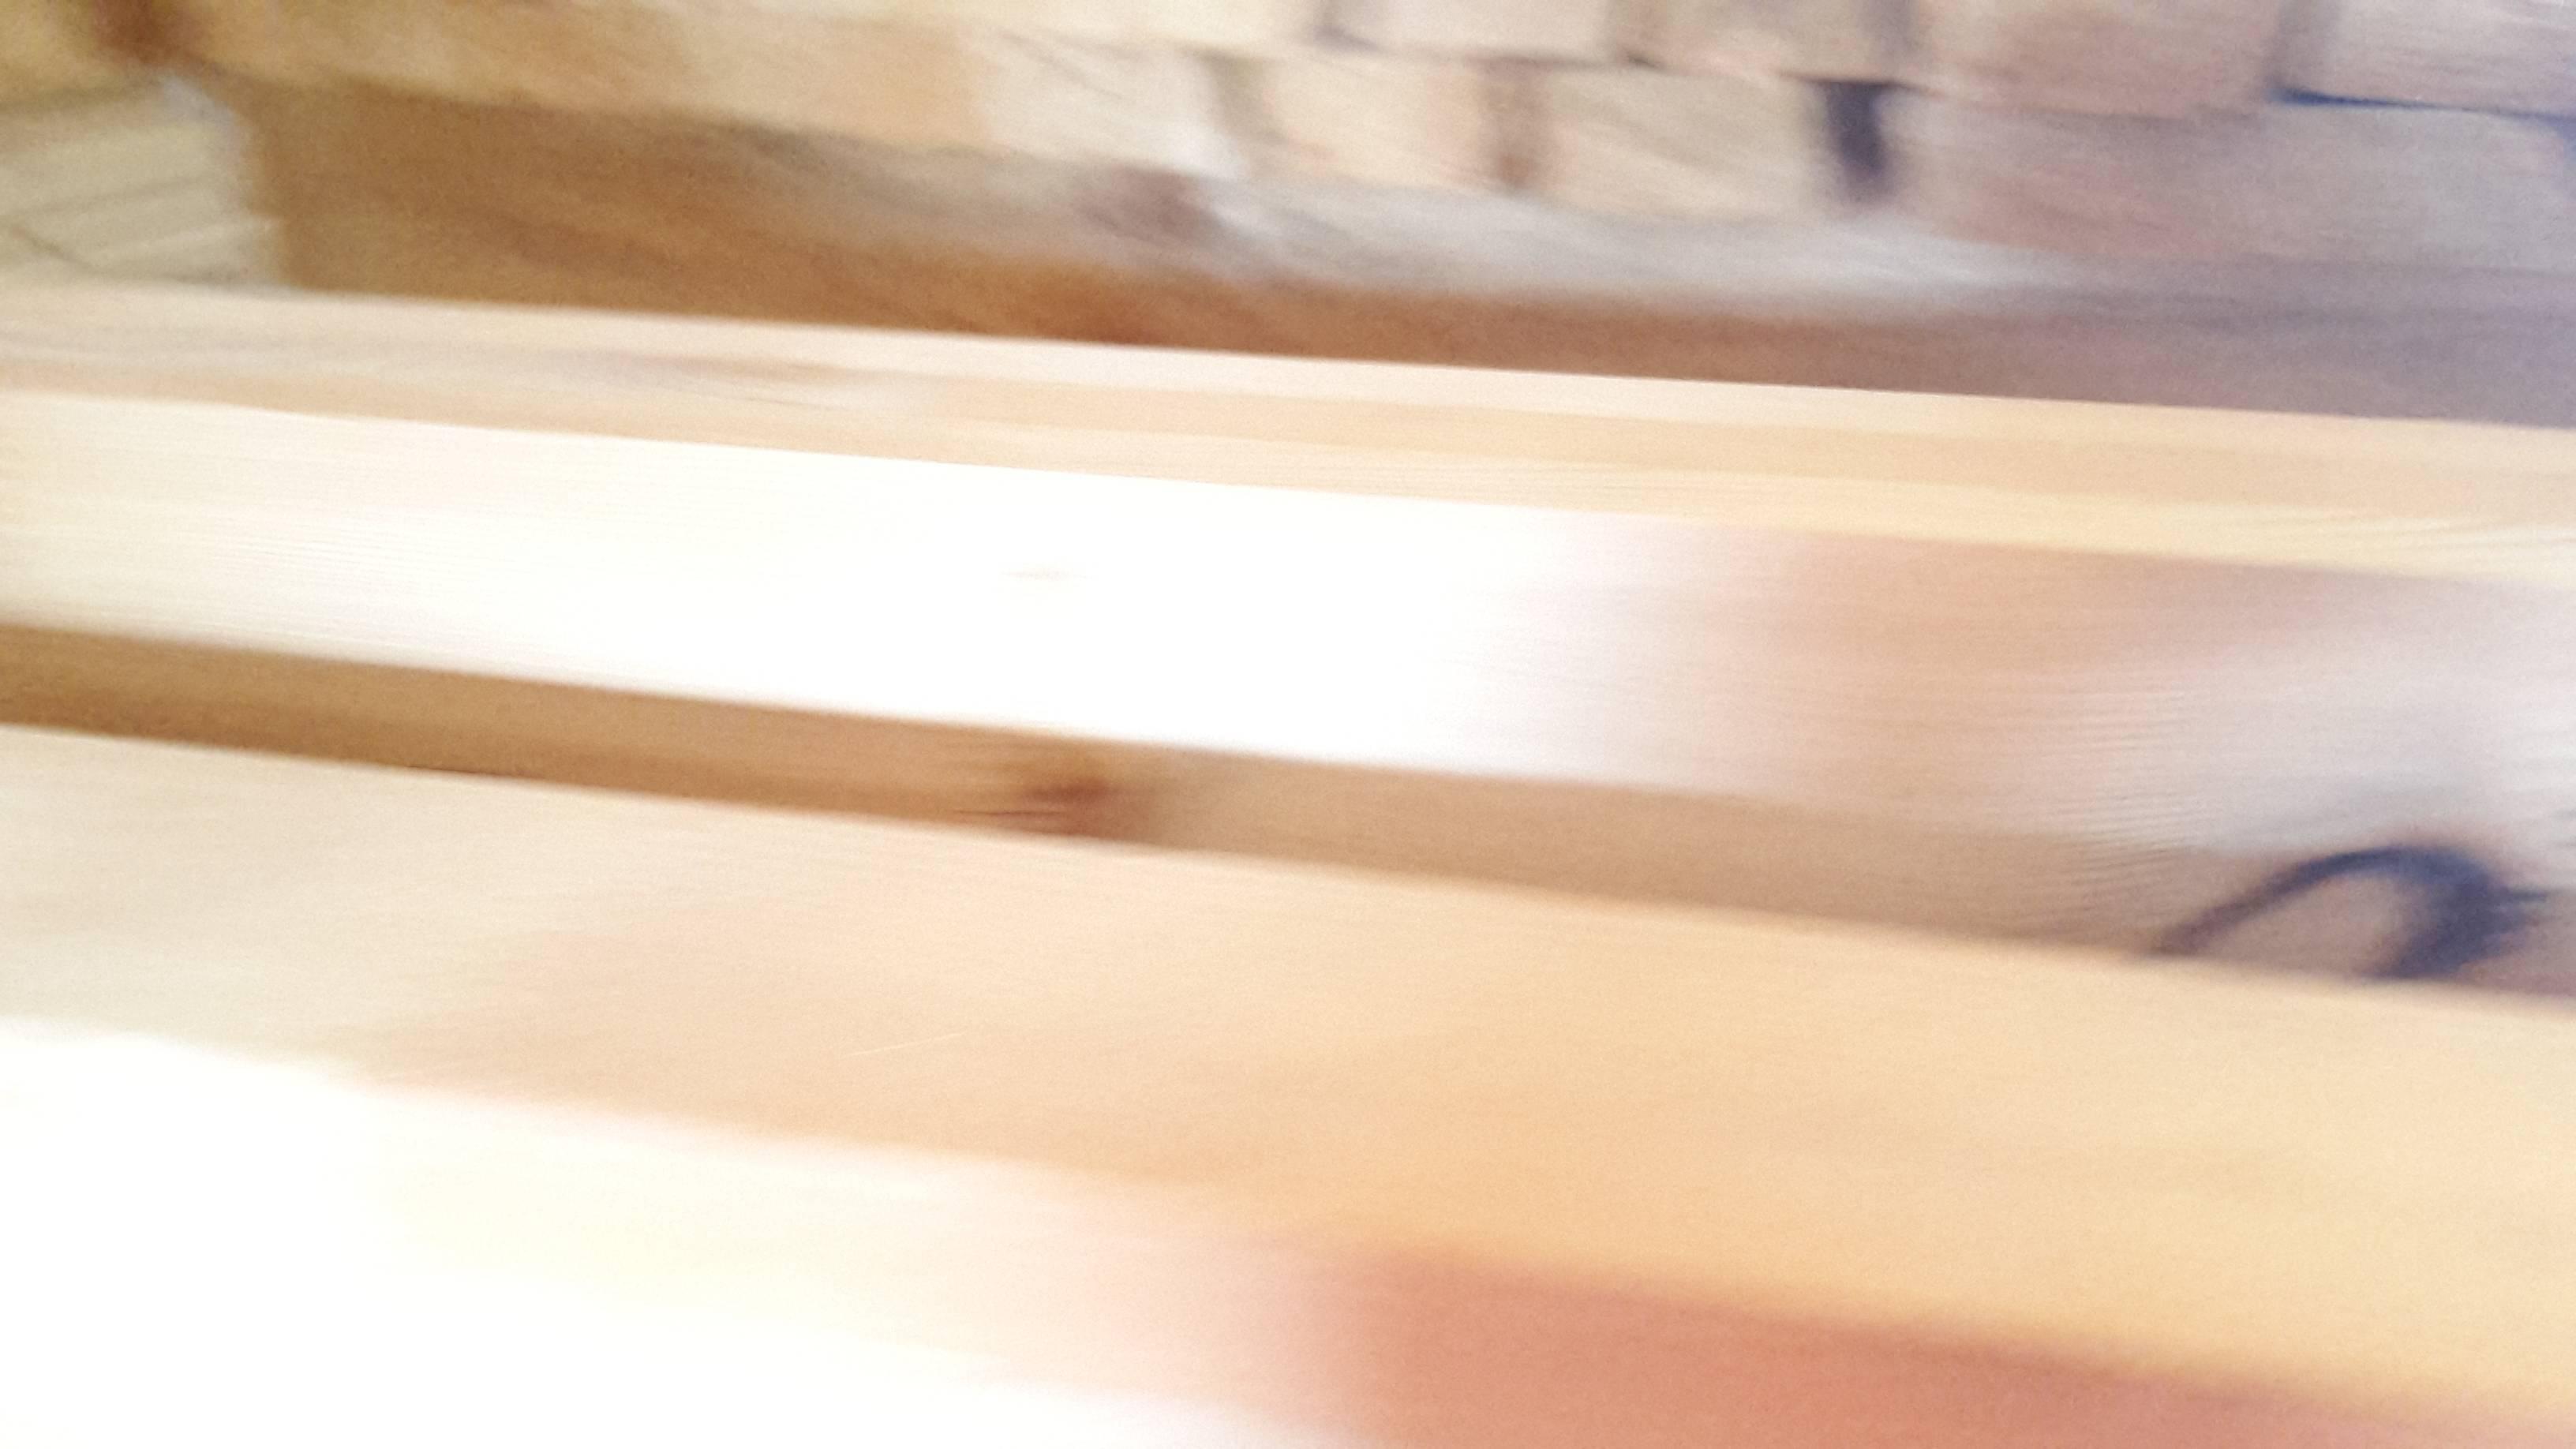 1 L/ÄRCHE KANTHOLZ BALKEN PFOSTEN HOLZ BAUHOLZ 60x60mm 300cm L/ÄNGE